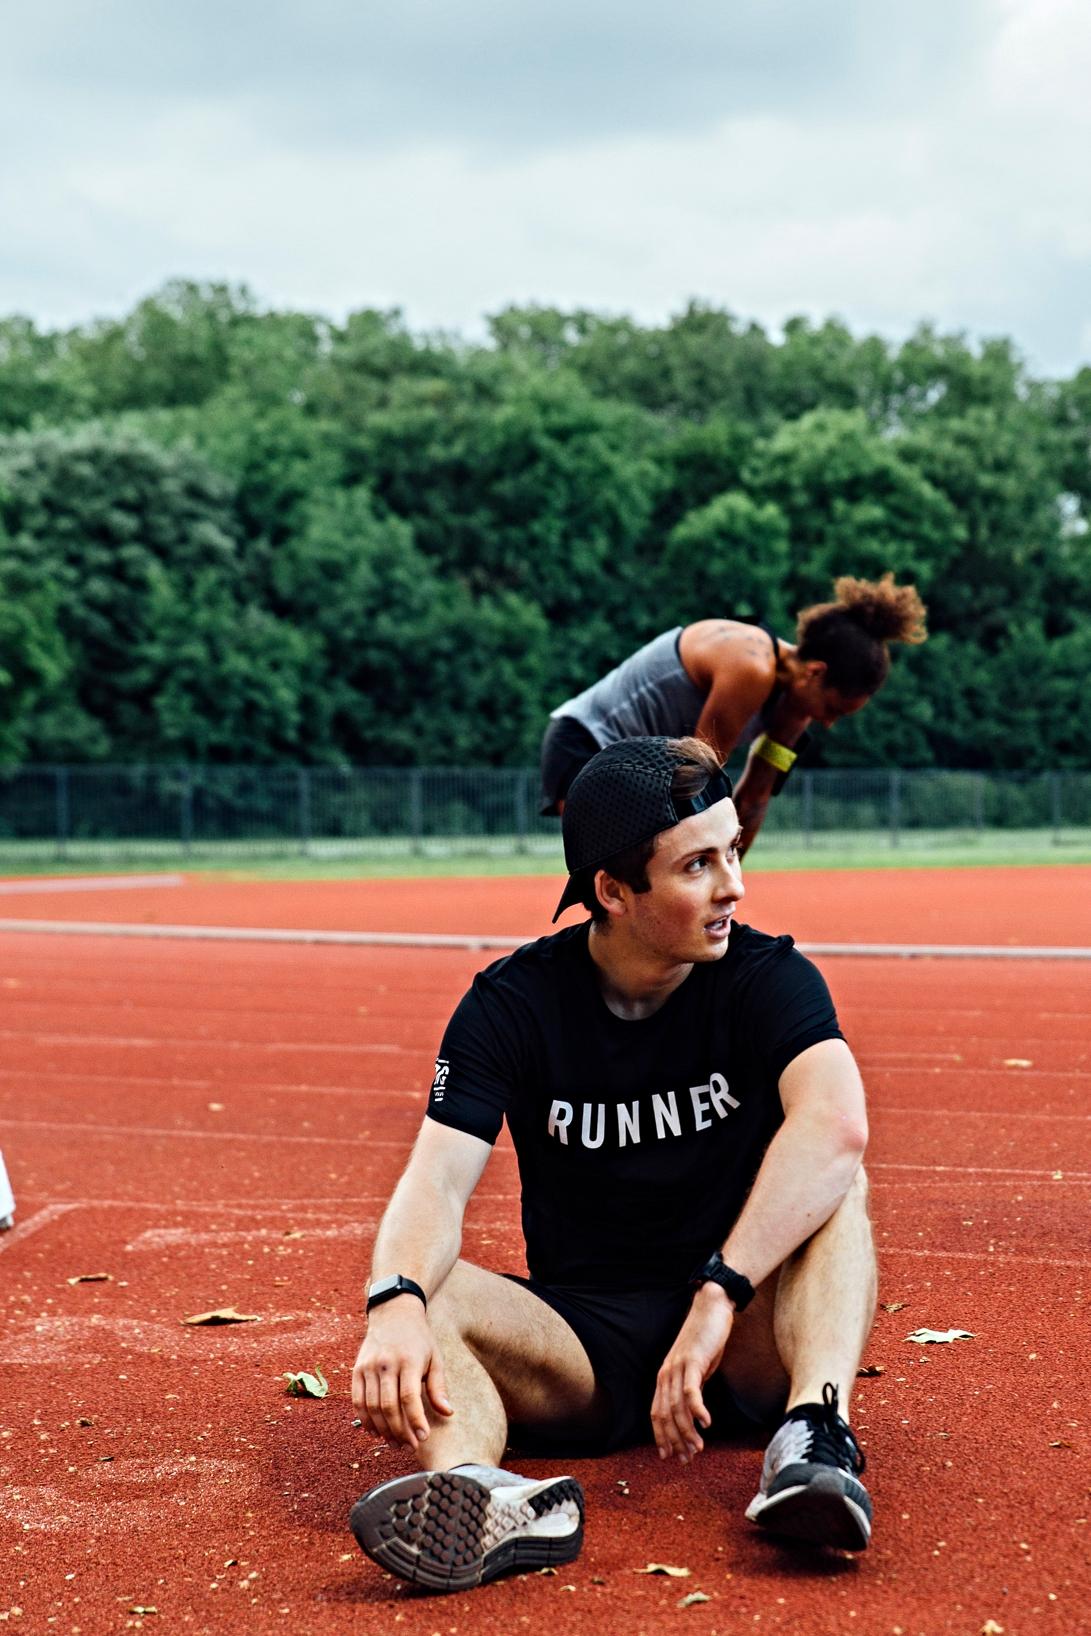 Rob Jones - London, England - Runner